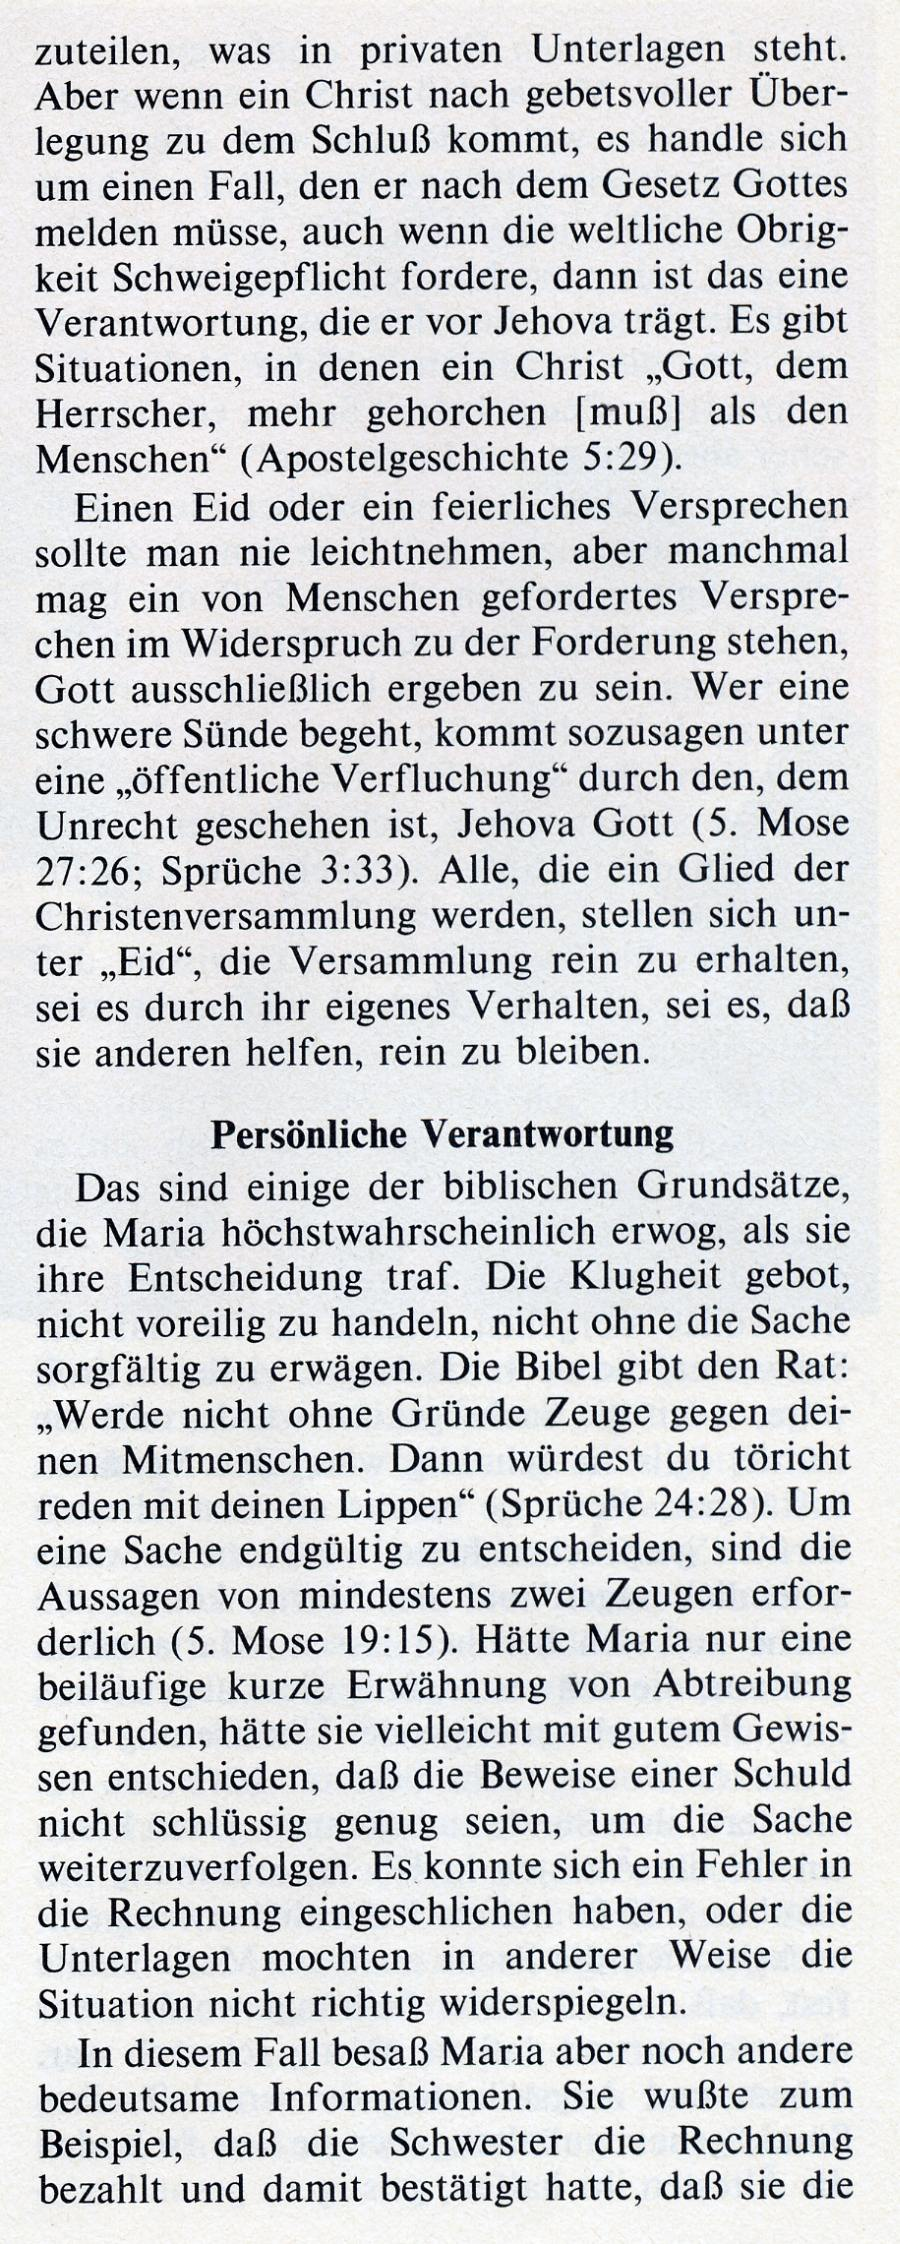 picture: http://www.manfred-gebhard.de/RFile0041.jpg